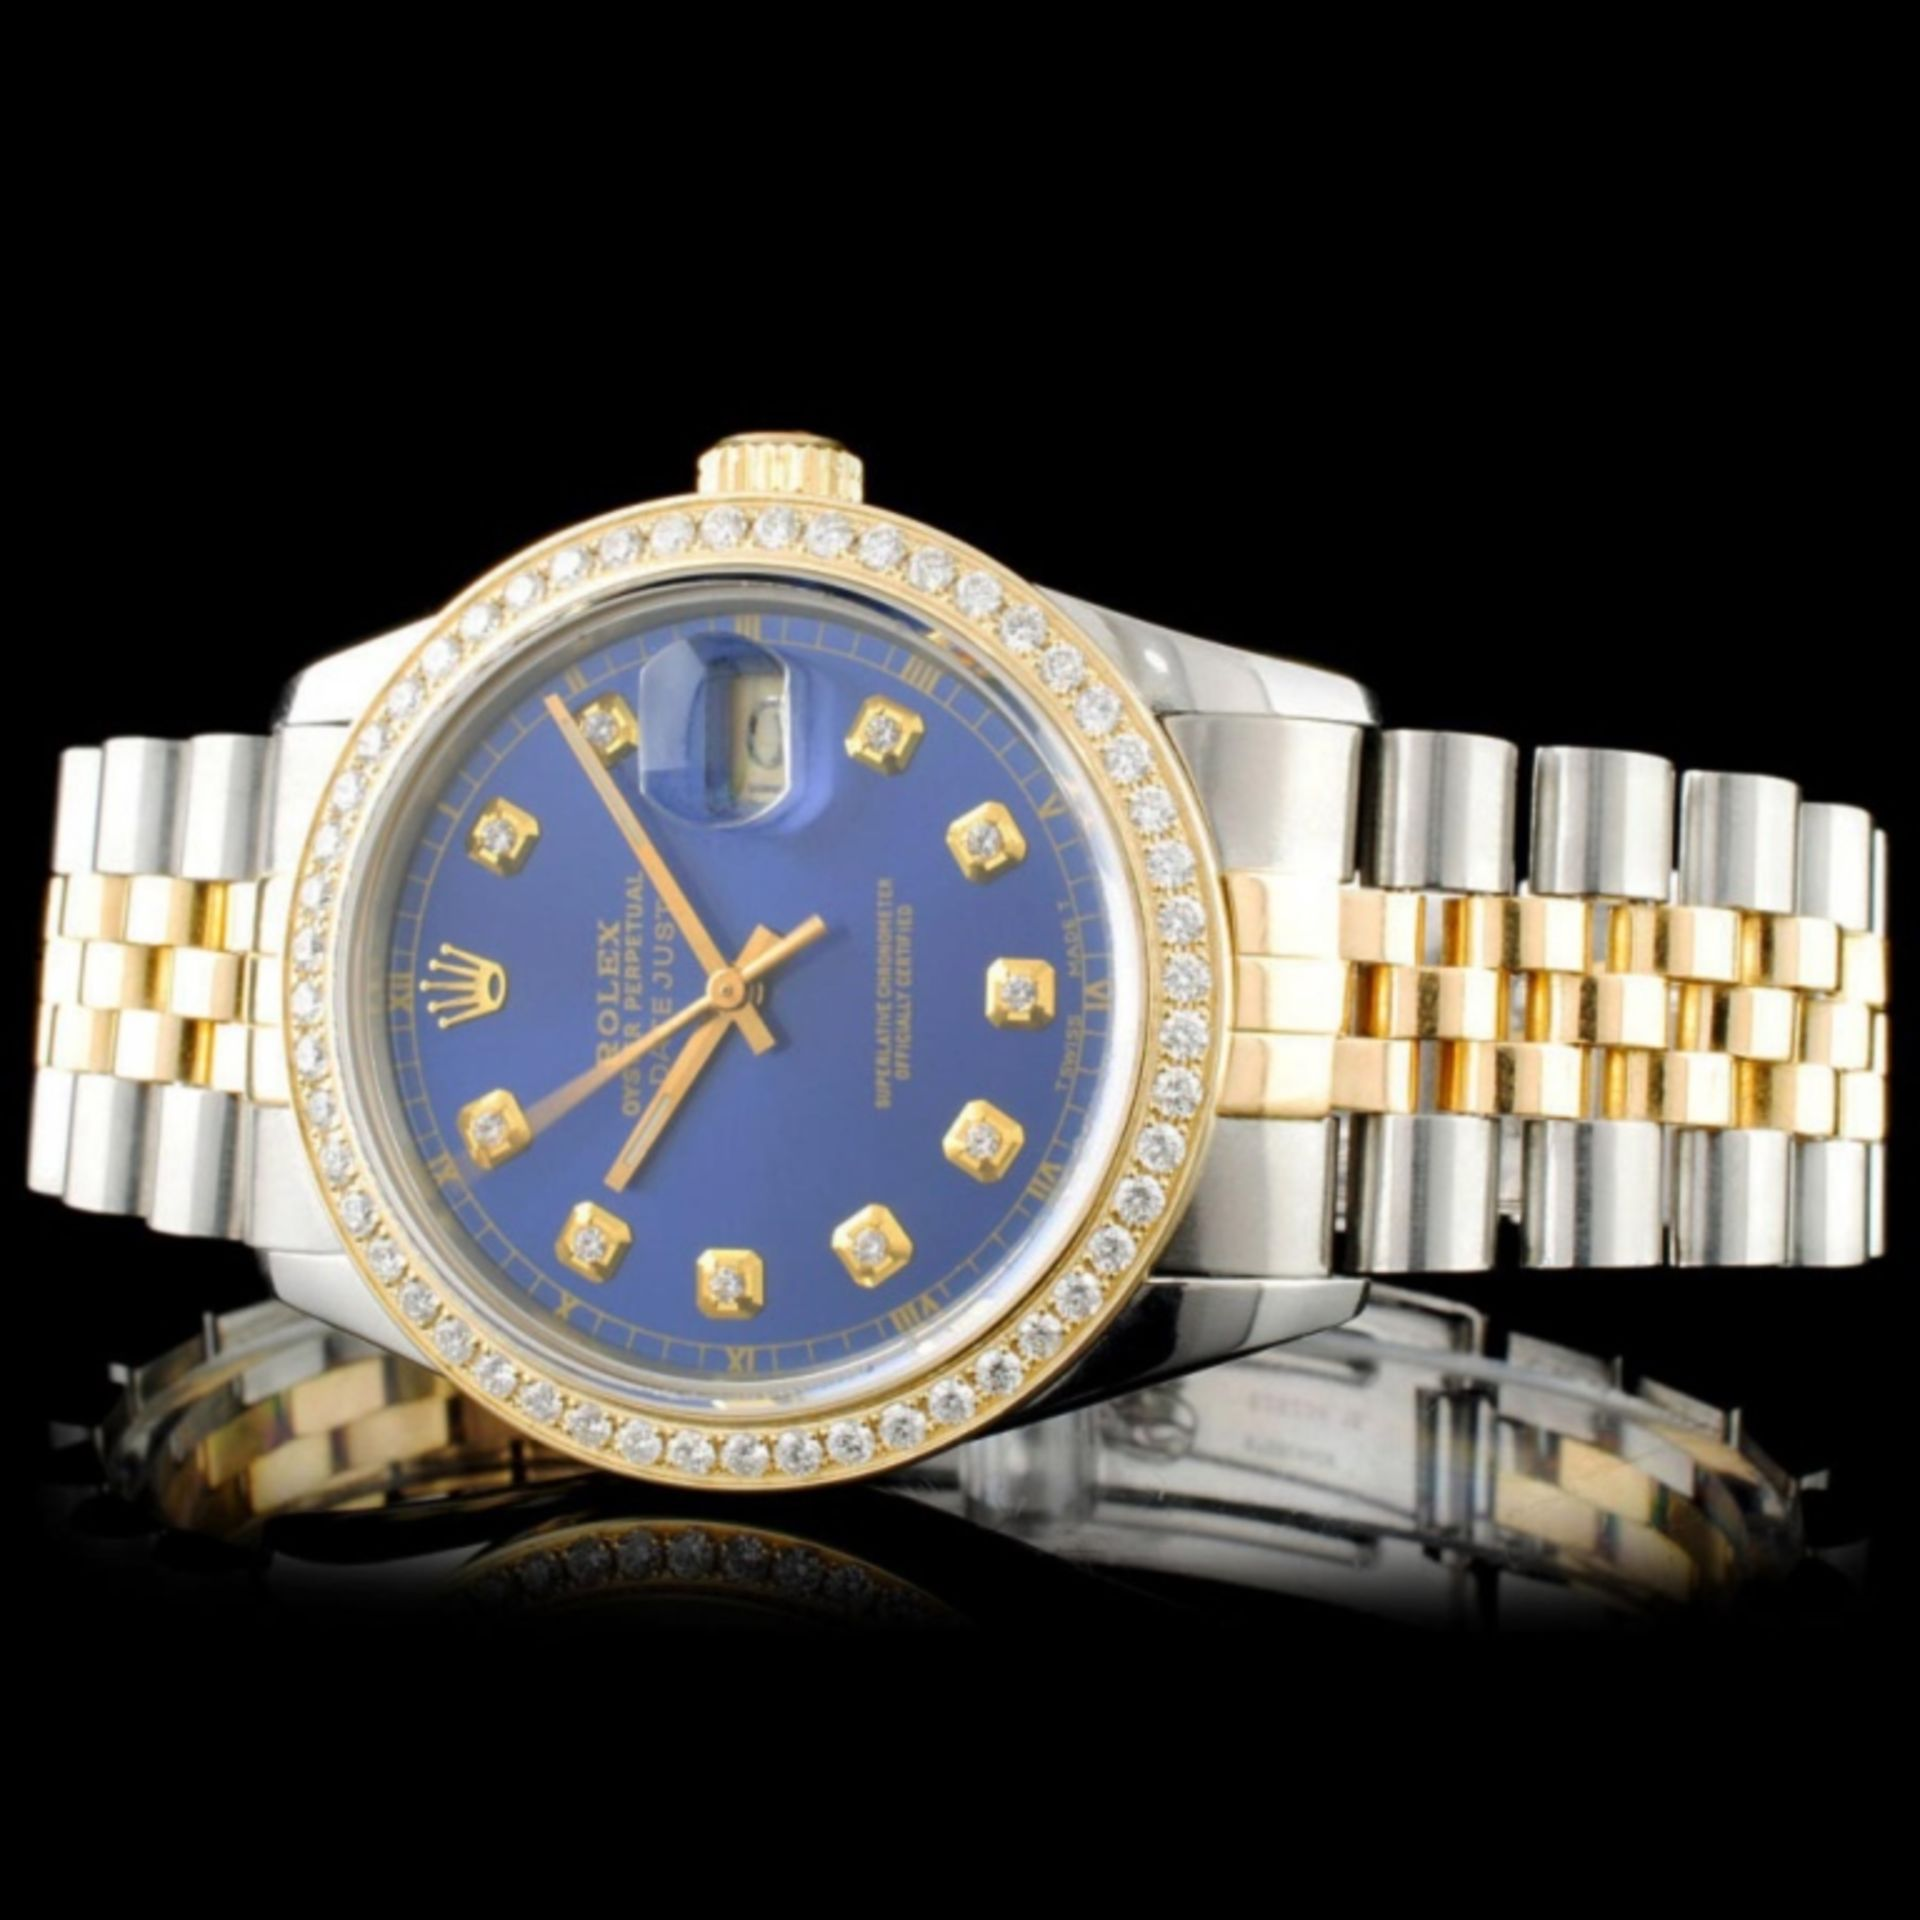 Rolex YG/SS DateJust Diamond 36MM Watch - Image 2 of 5